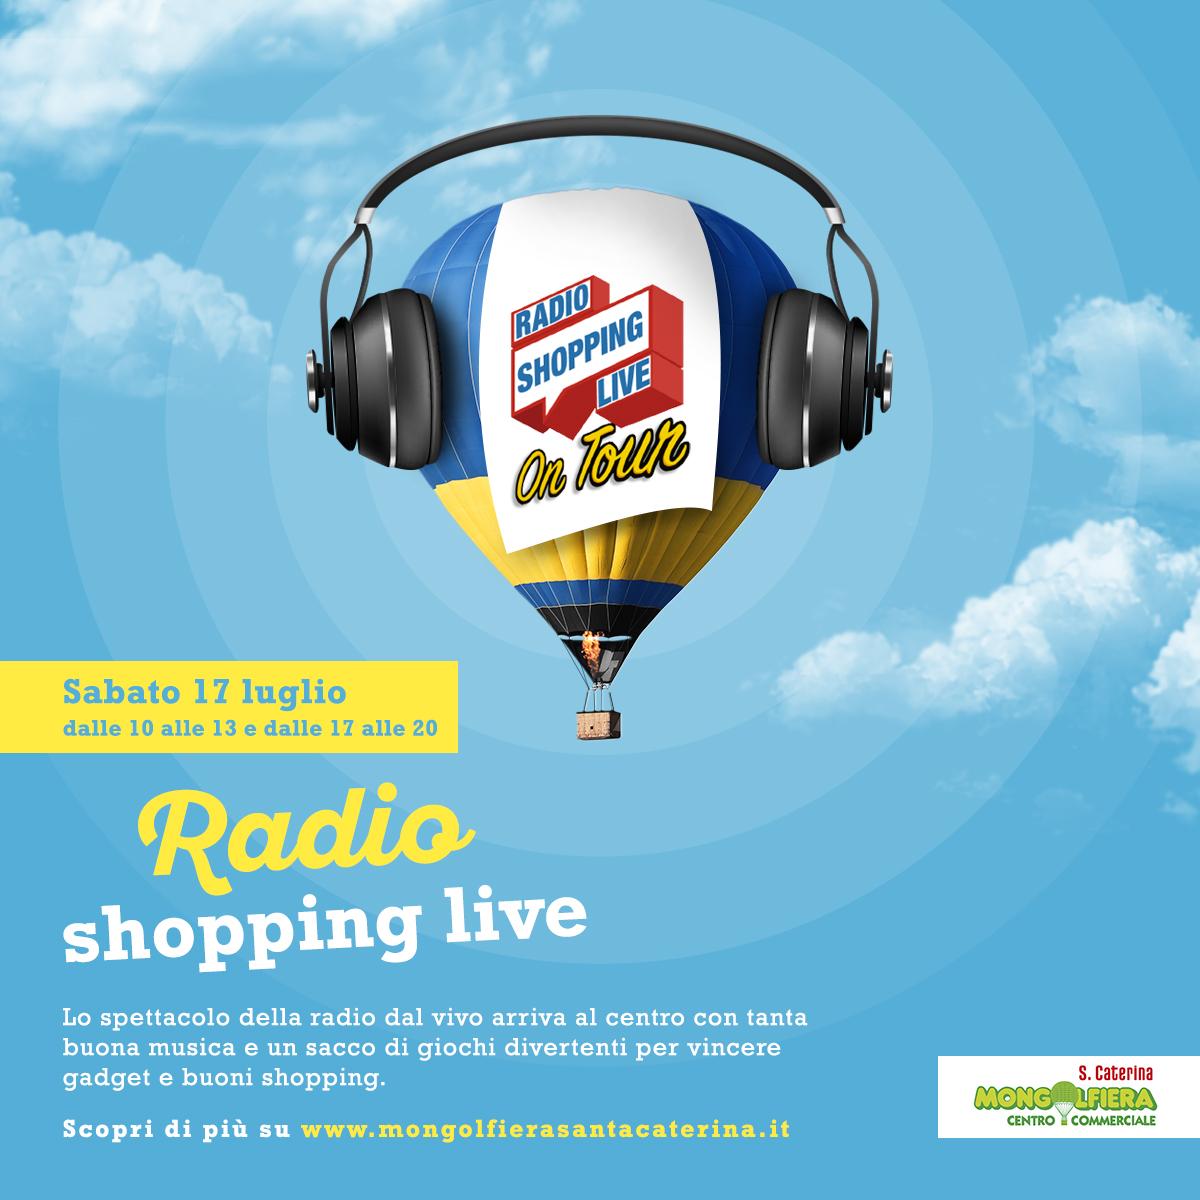 Radio Shopping Live on tour al Mongolfiera Santa Caterina